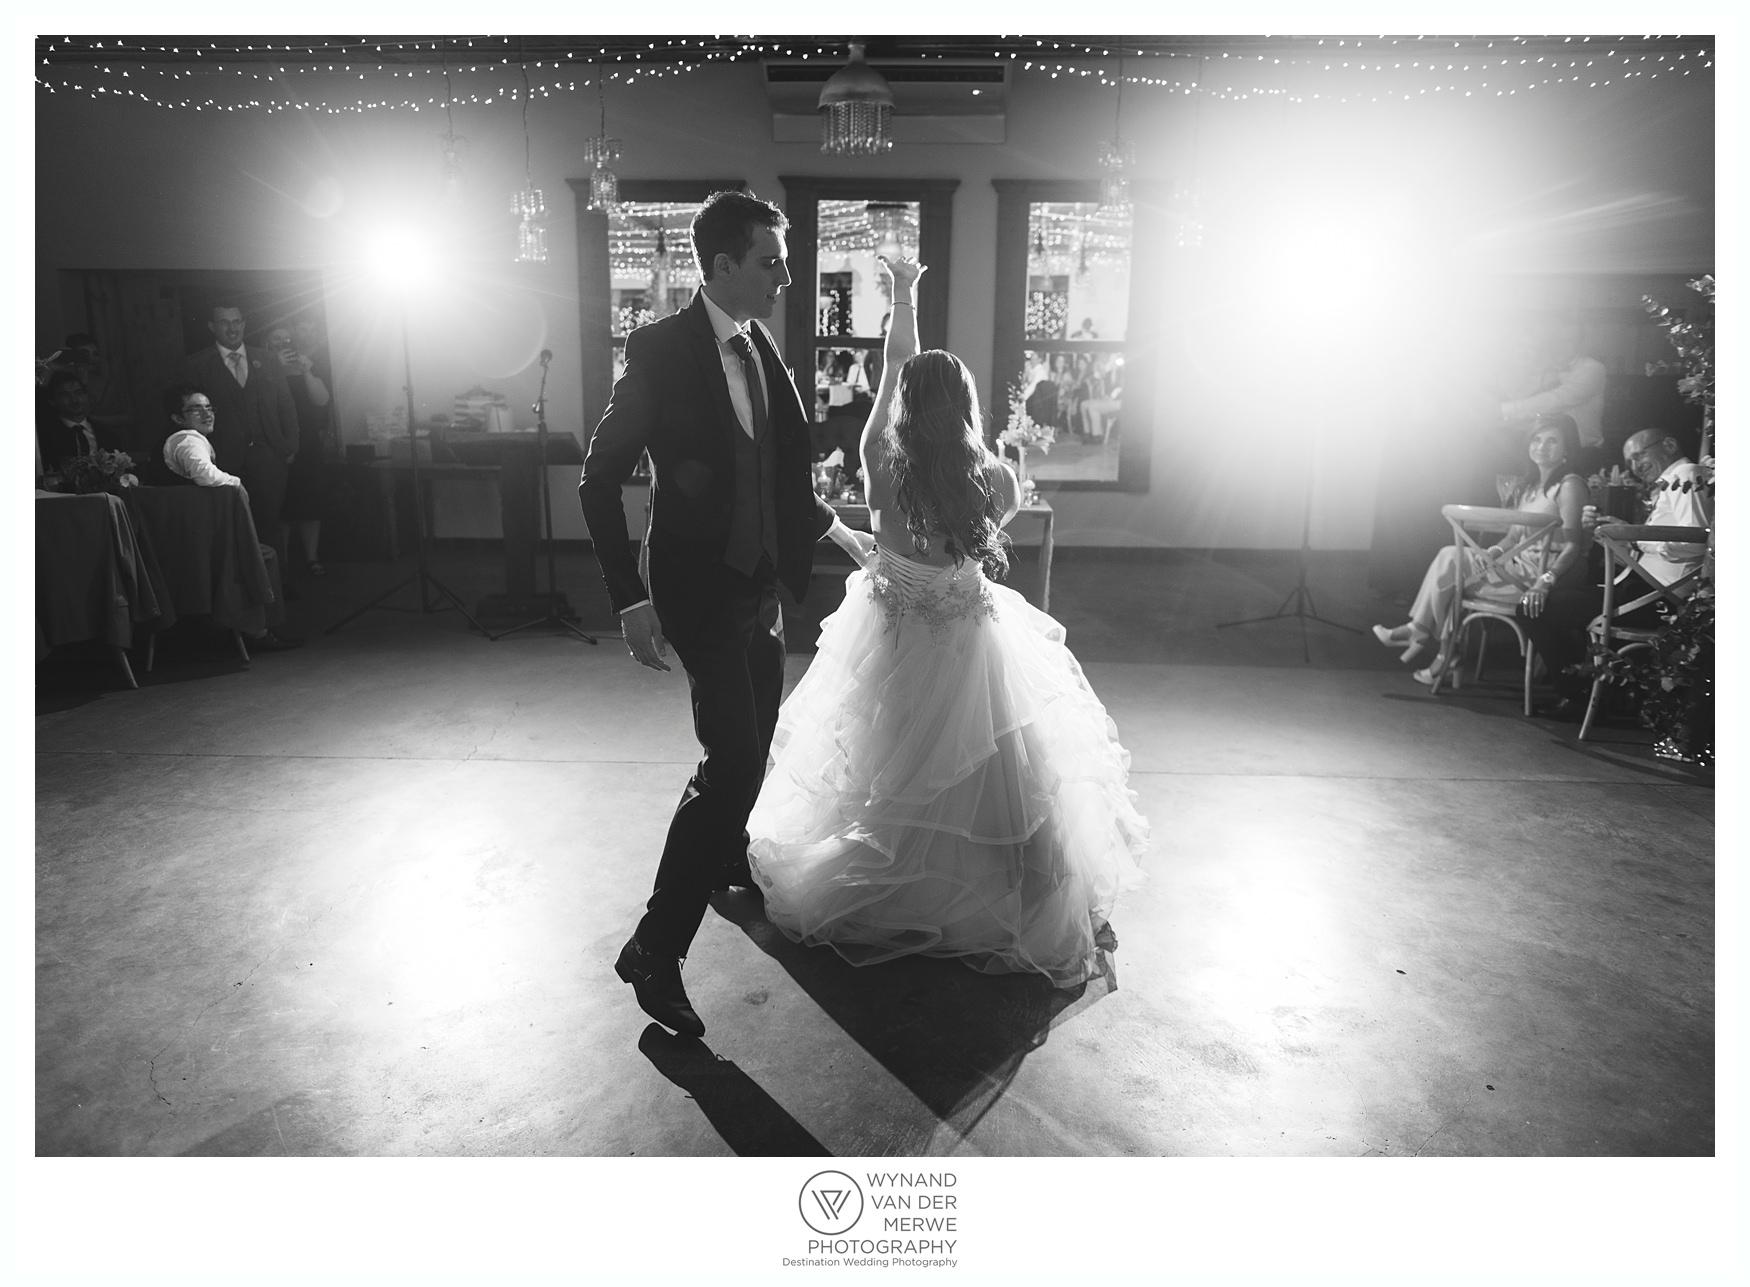 Wynandvandermerwe ryan natalia wedding photography cradle valley guesthouse gauteng-36.jpg